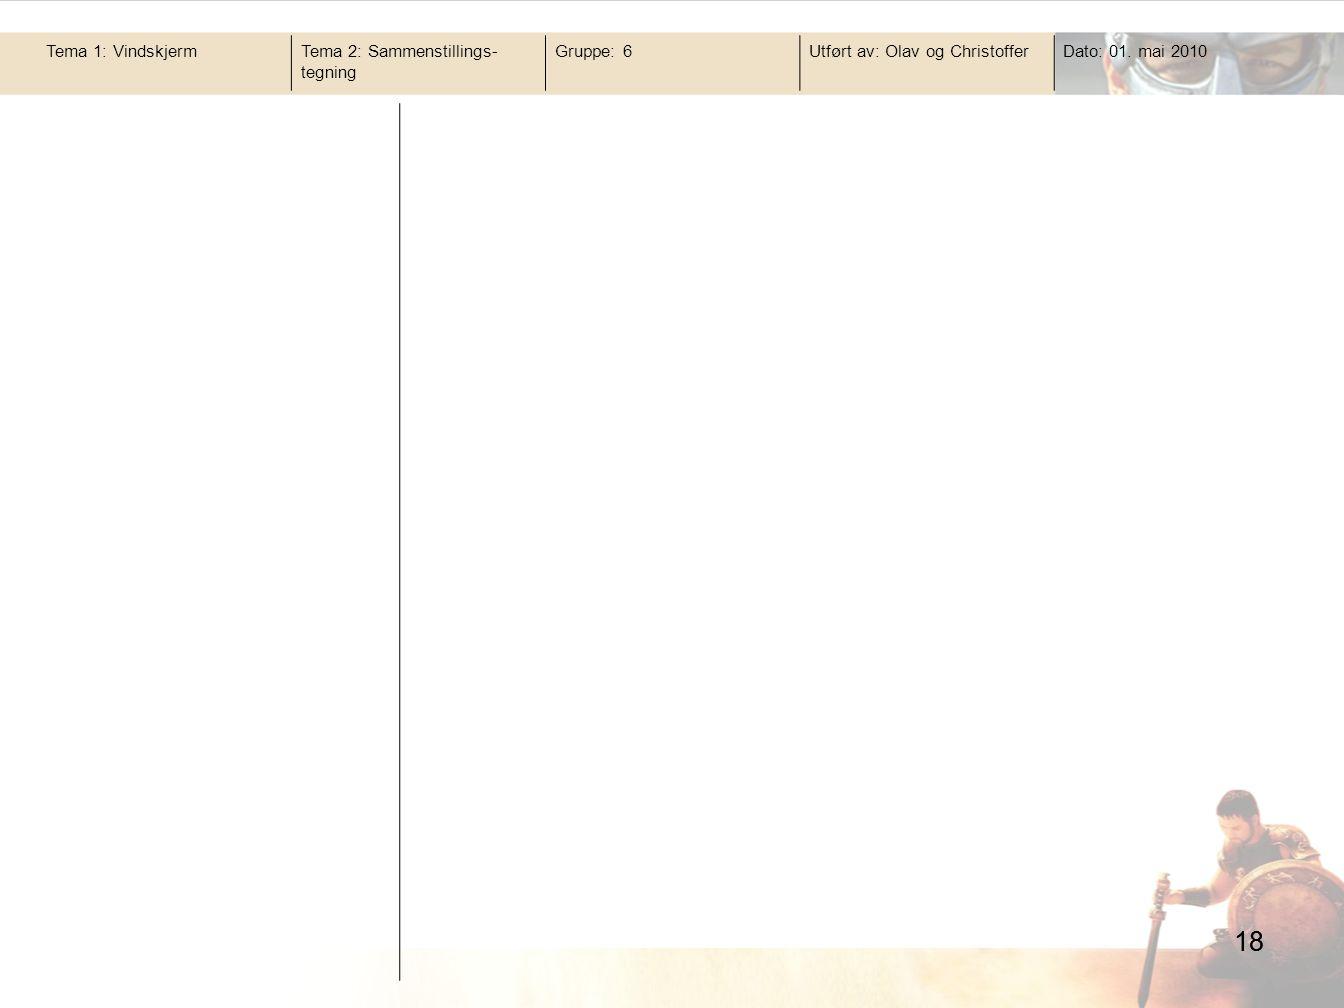 18 Tema 1: Vindskjerm Tema 2: Sammenstillings-tegning Gruppe: 6